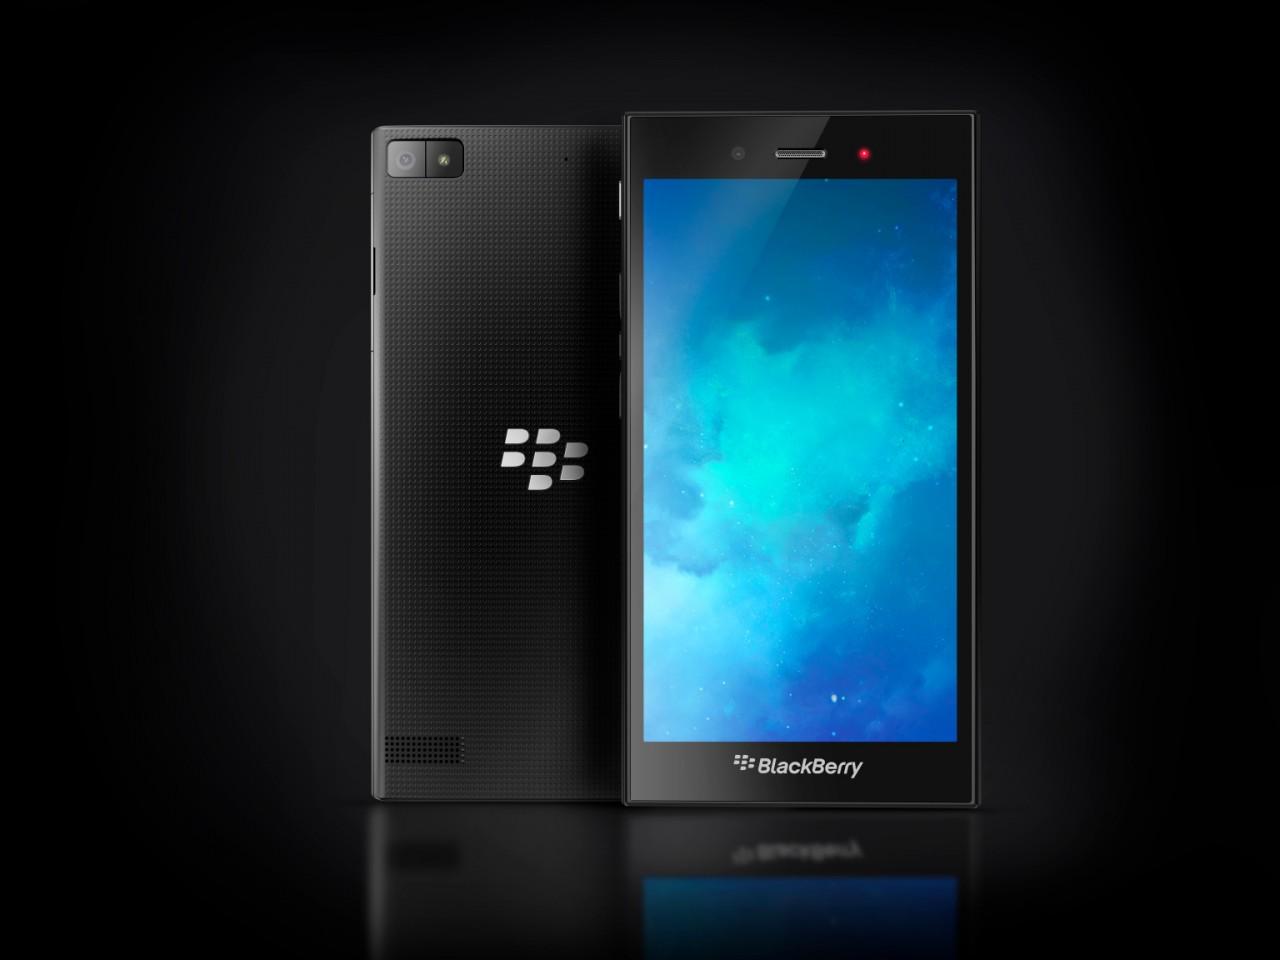 blackberry-z3-on-black